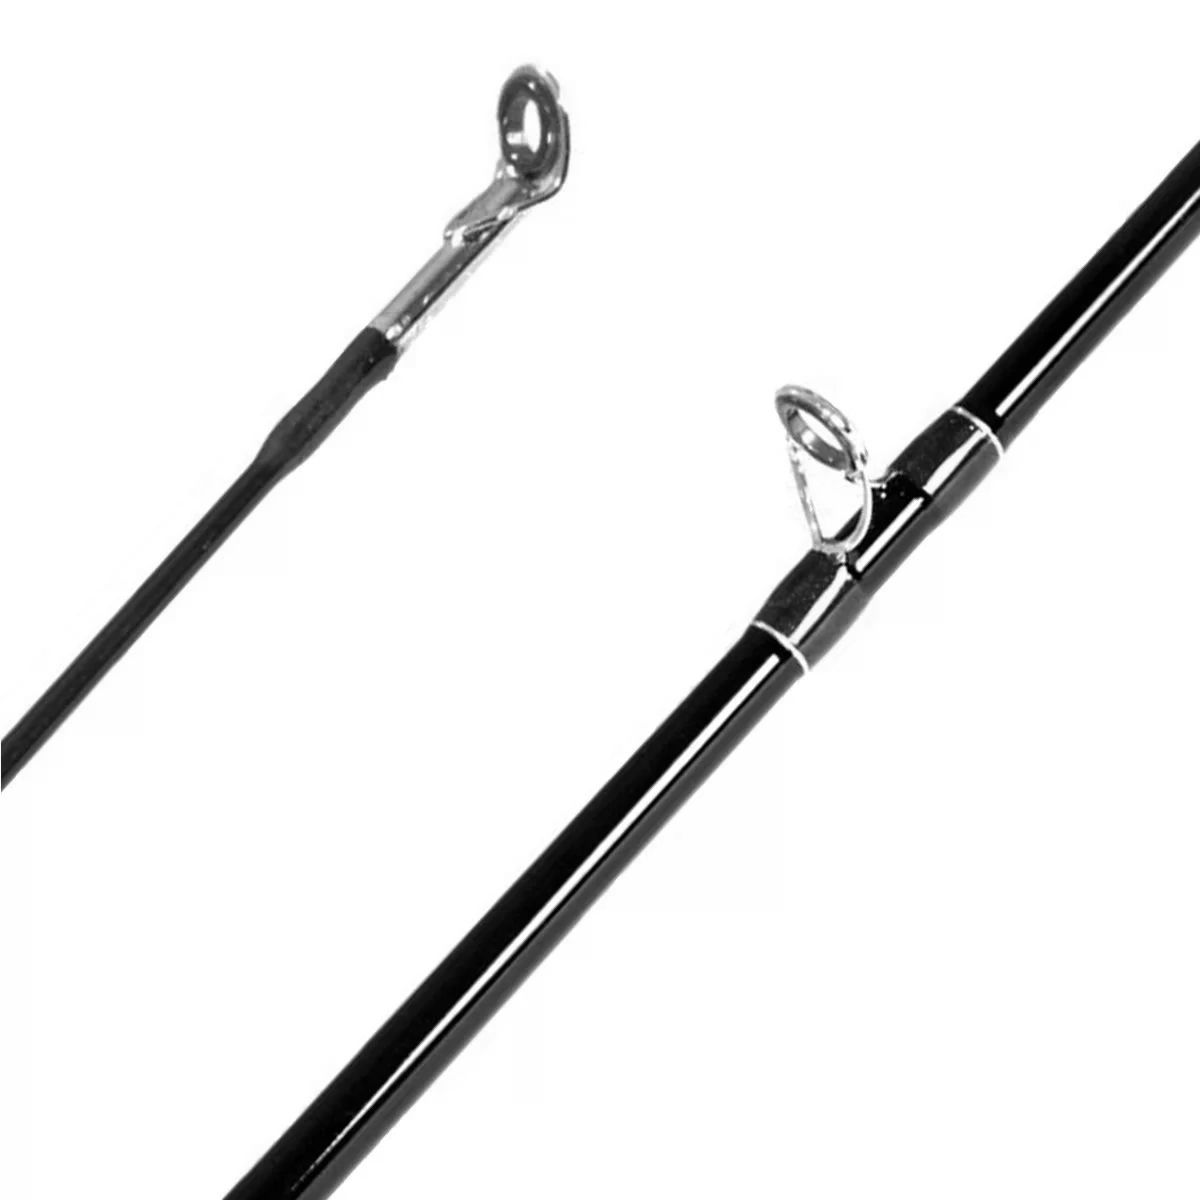 Vara Lumis Carretilha Infinity 1.83 m 08-20 lbs 2 Partes Black